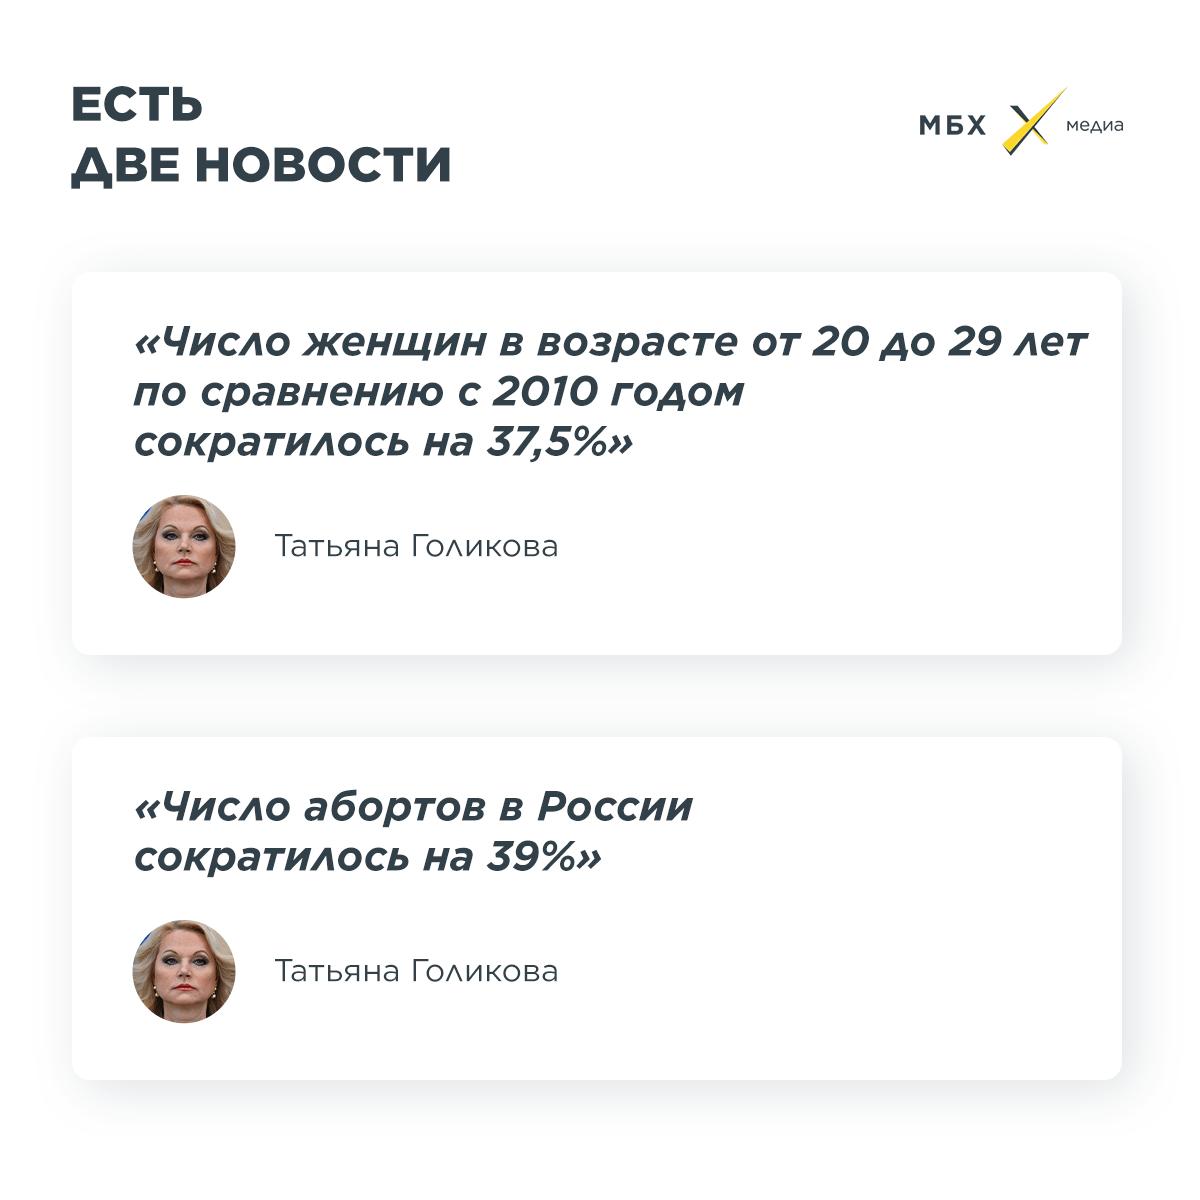 https://pbs.twimg.com/media/Exu4us_WQAEvC-L?format=jpg&name=medium